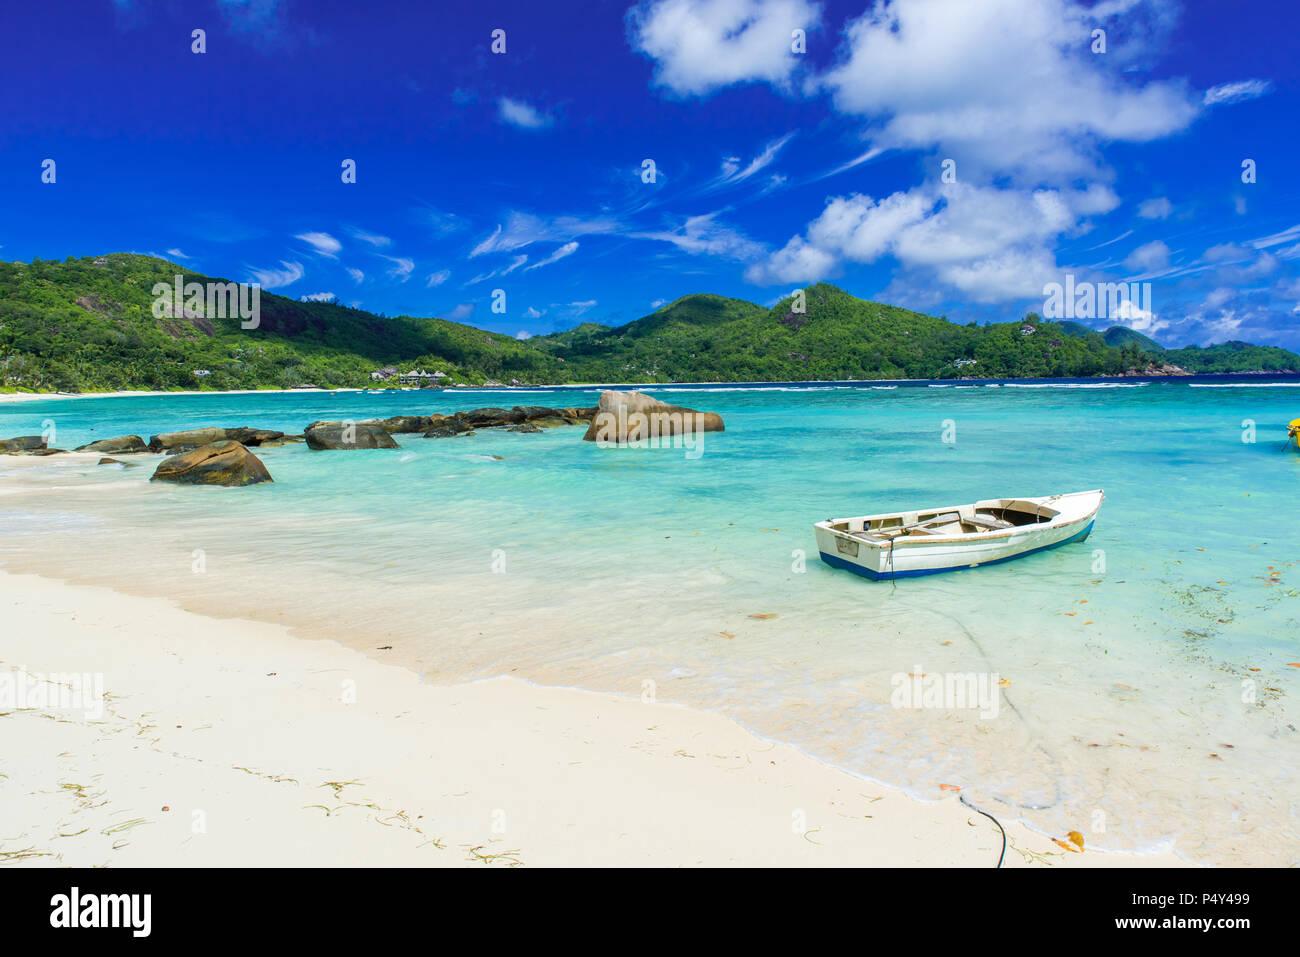 Petite Anse - beautiful beach on island Mahe, Seychelles Stock Photo